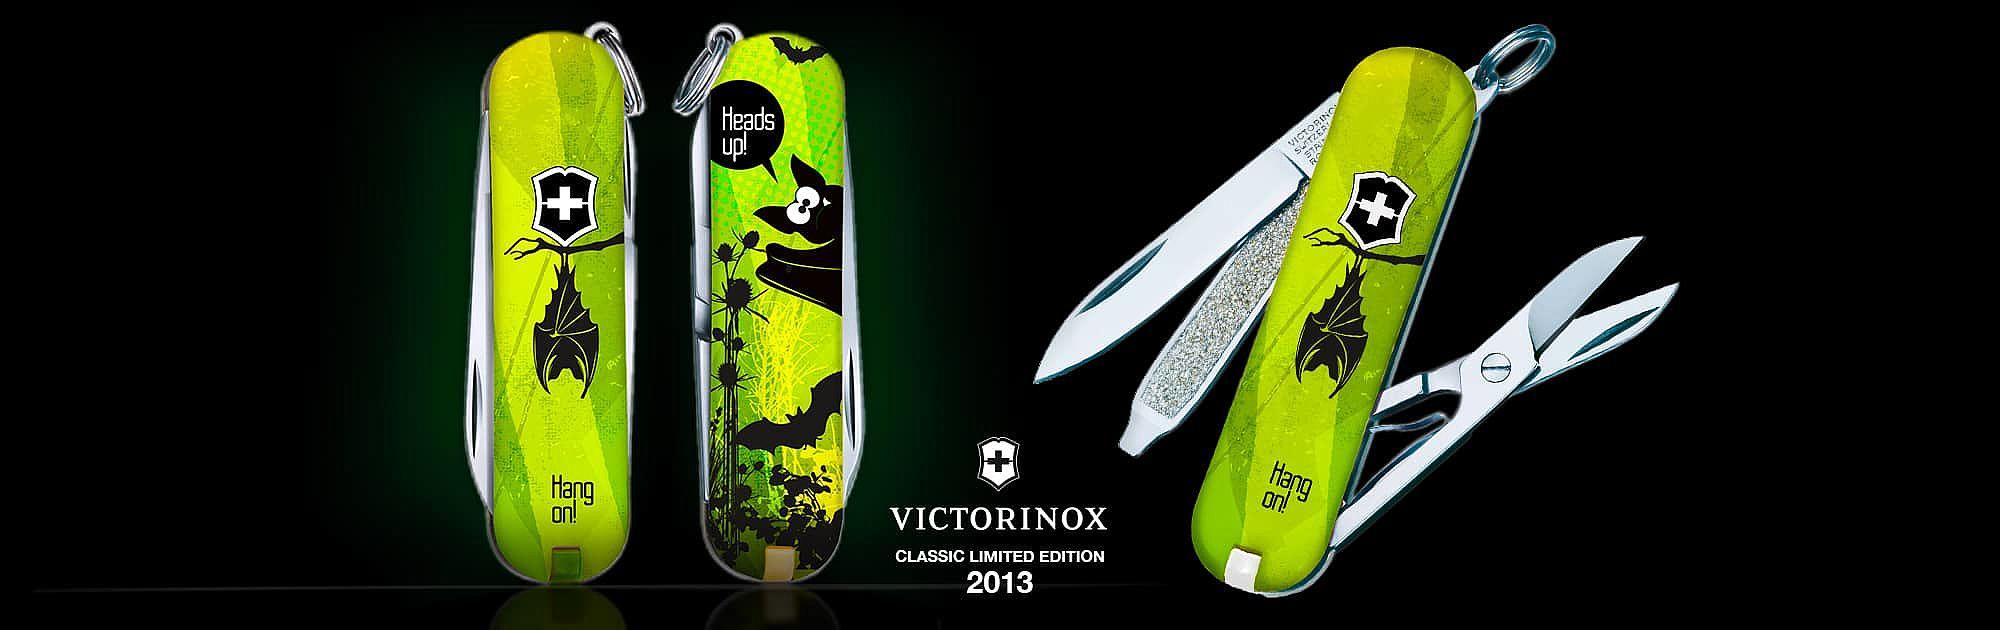 Victorinox 2013